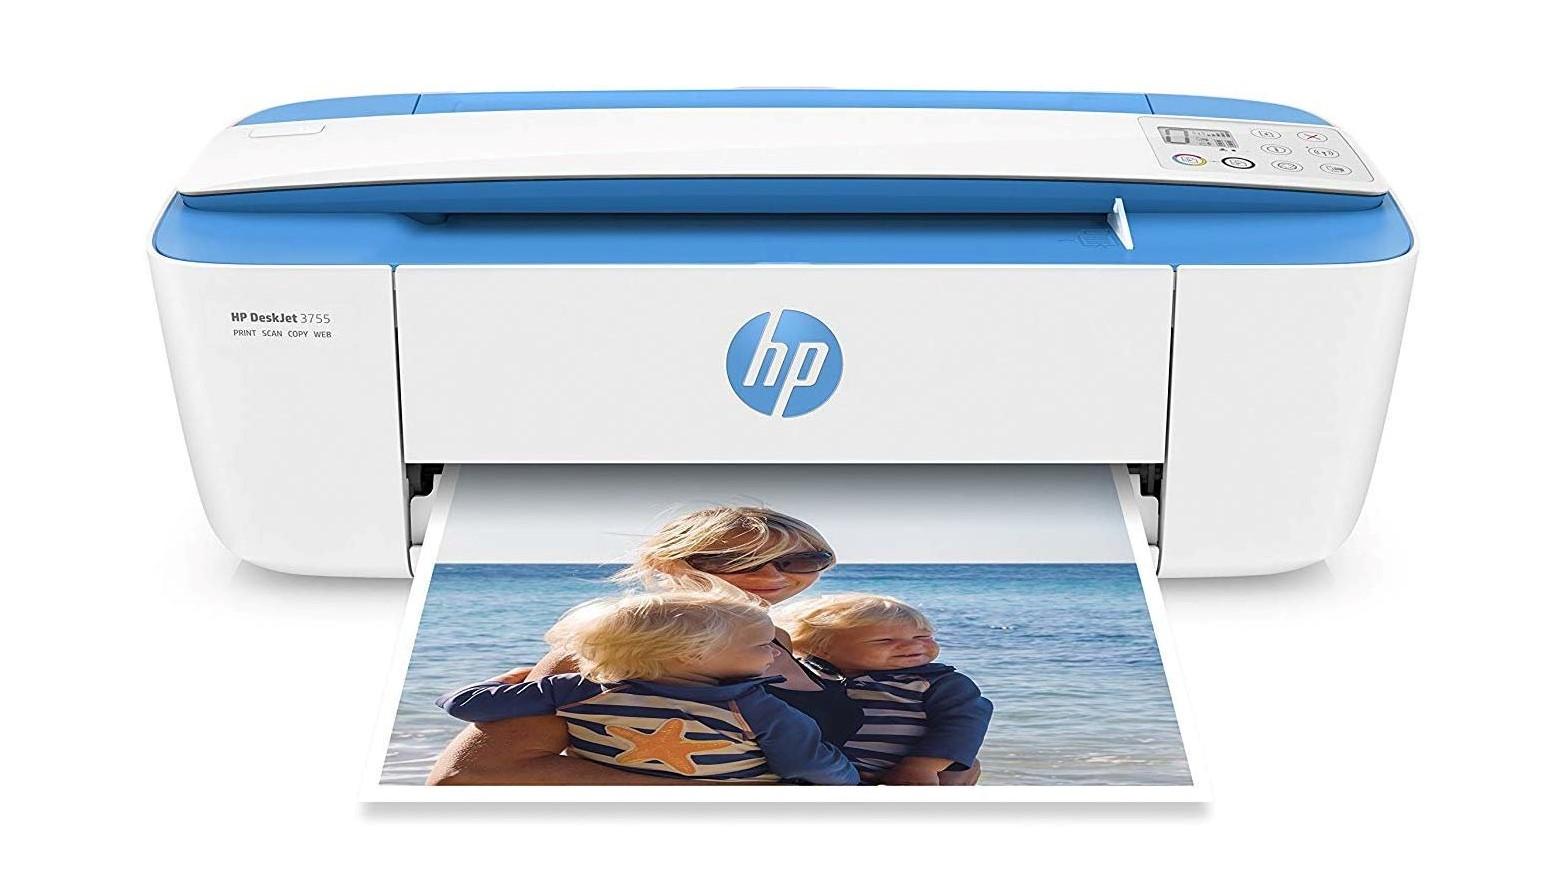 HP DeskJet 3755 all in one printer